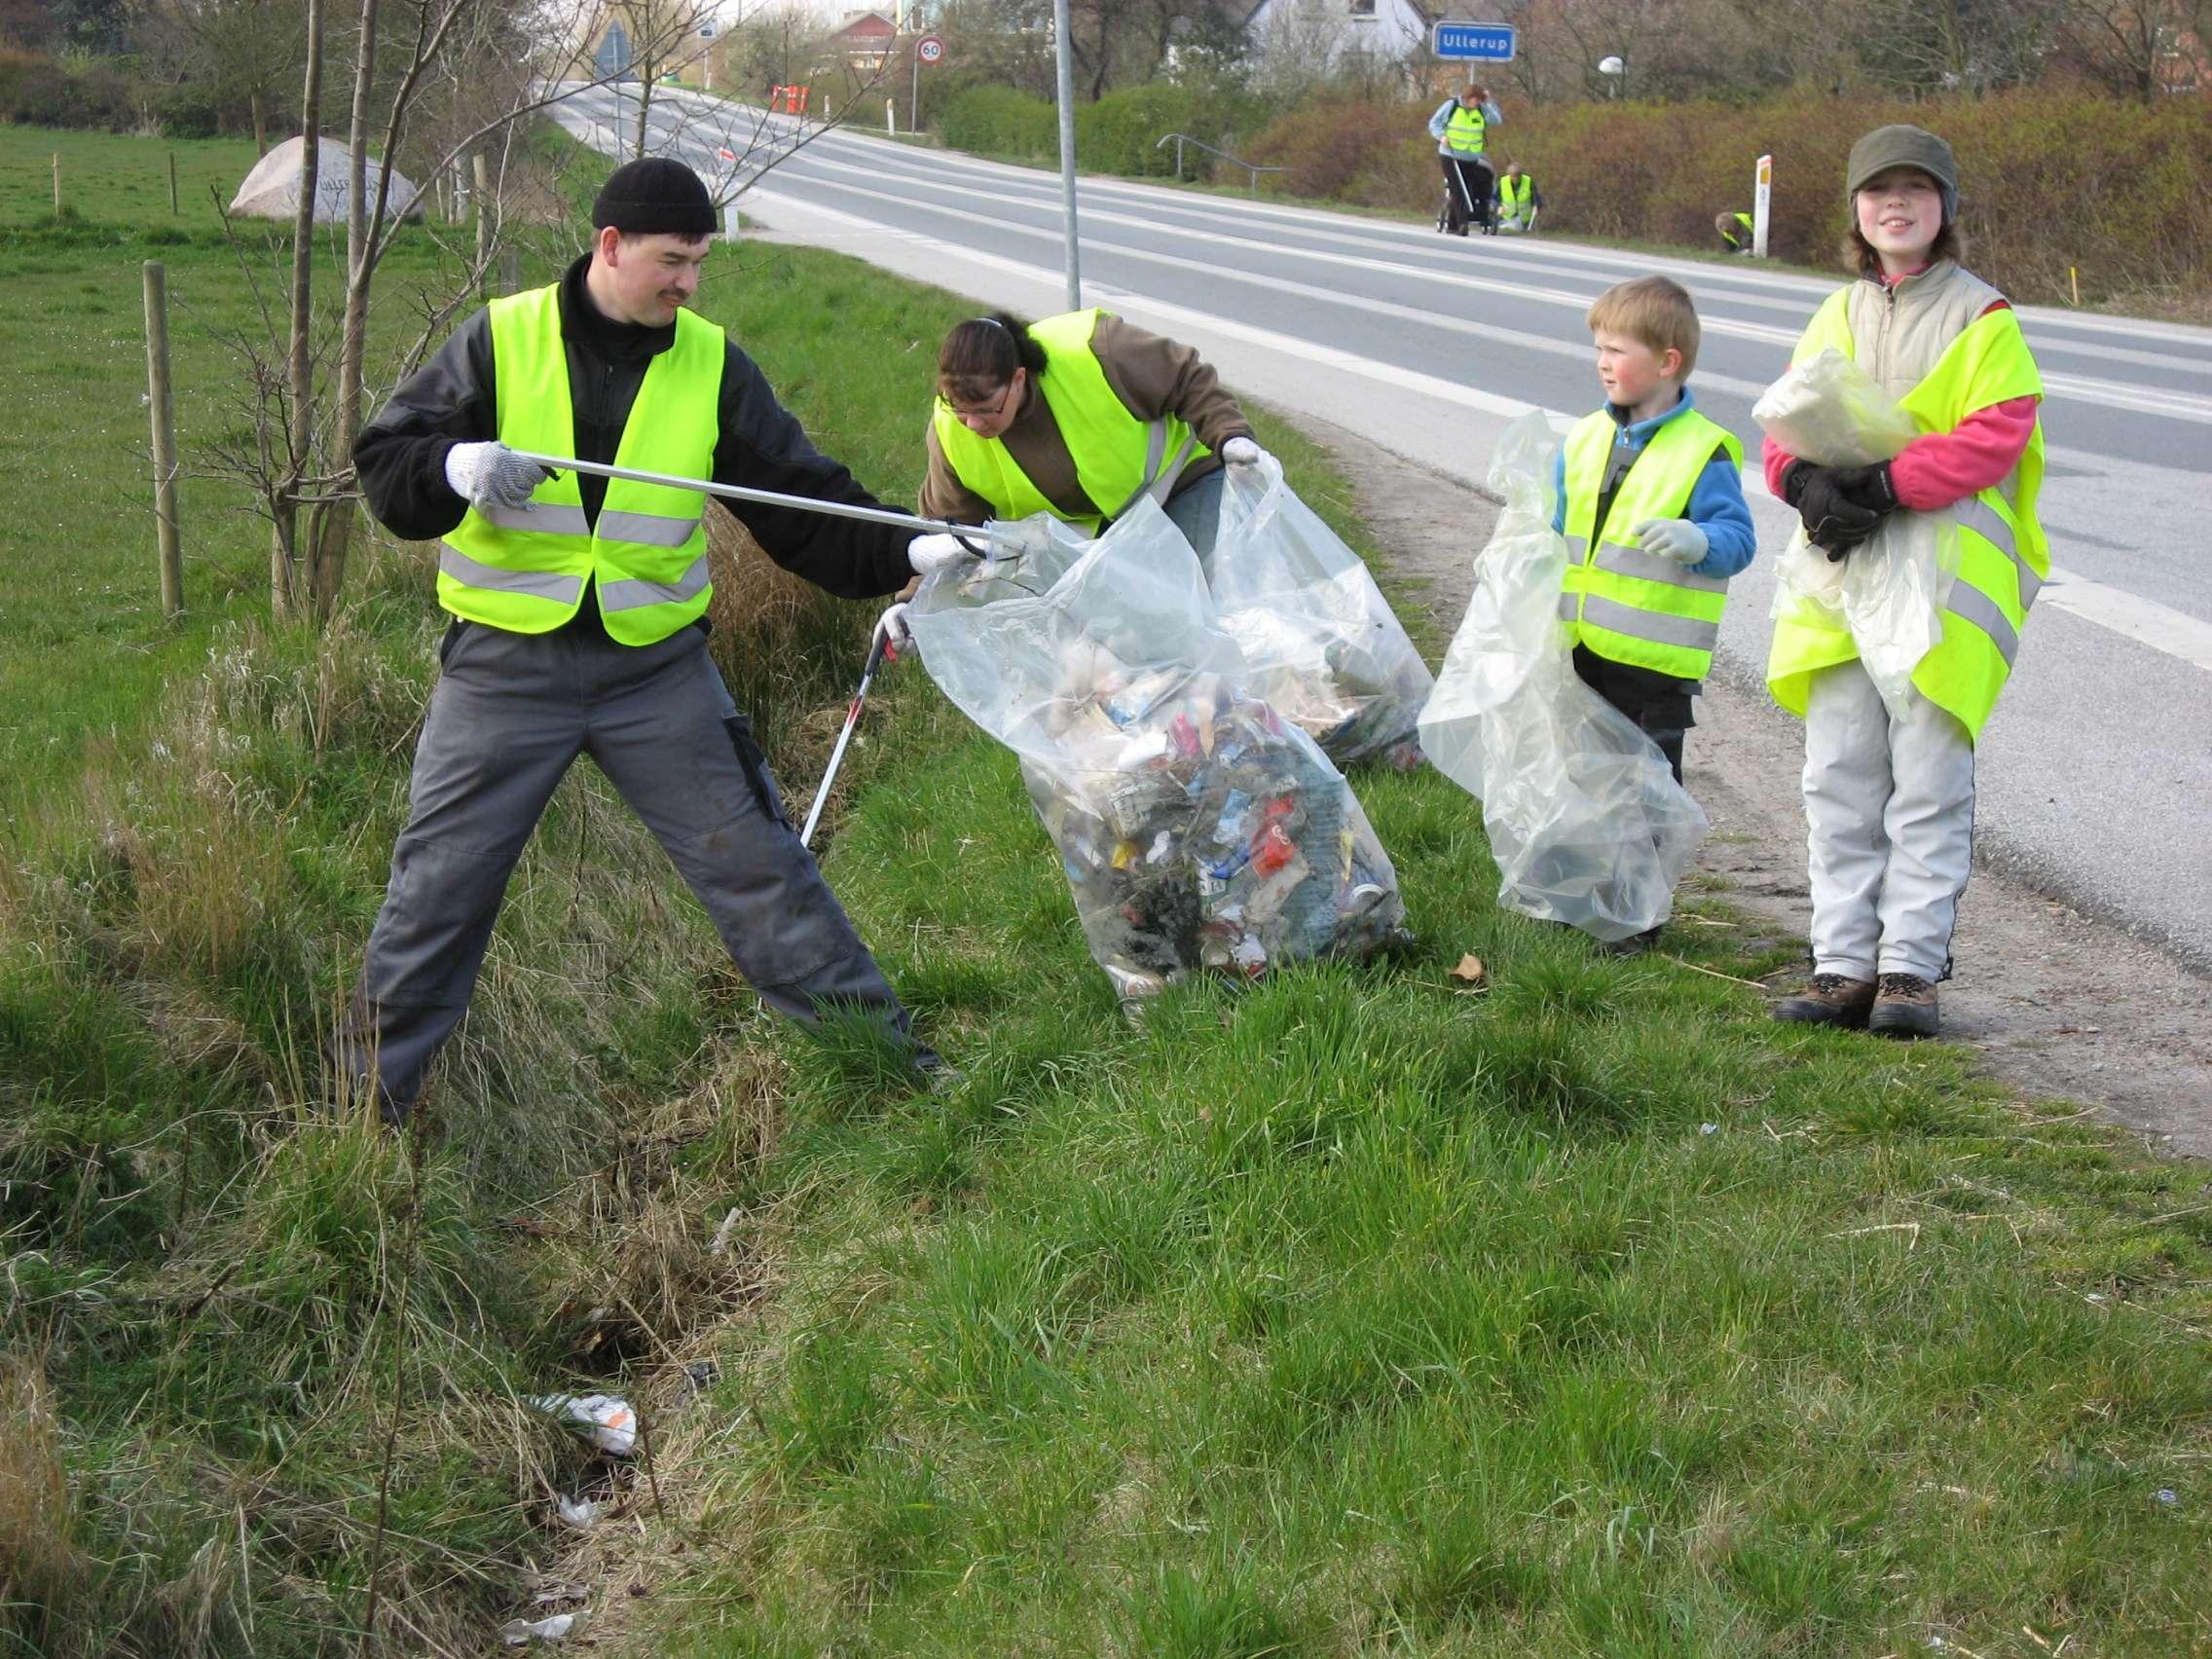 affaldsindsamling2008-006.jpg